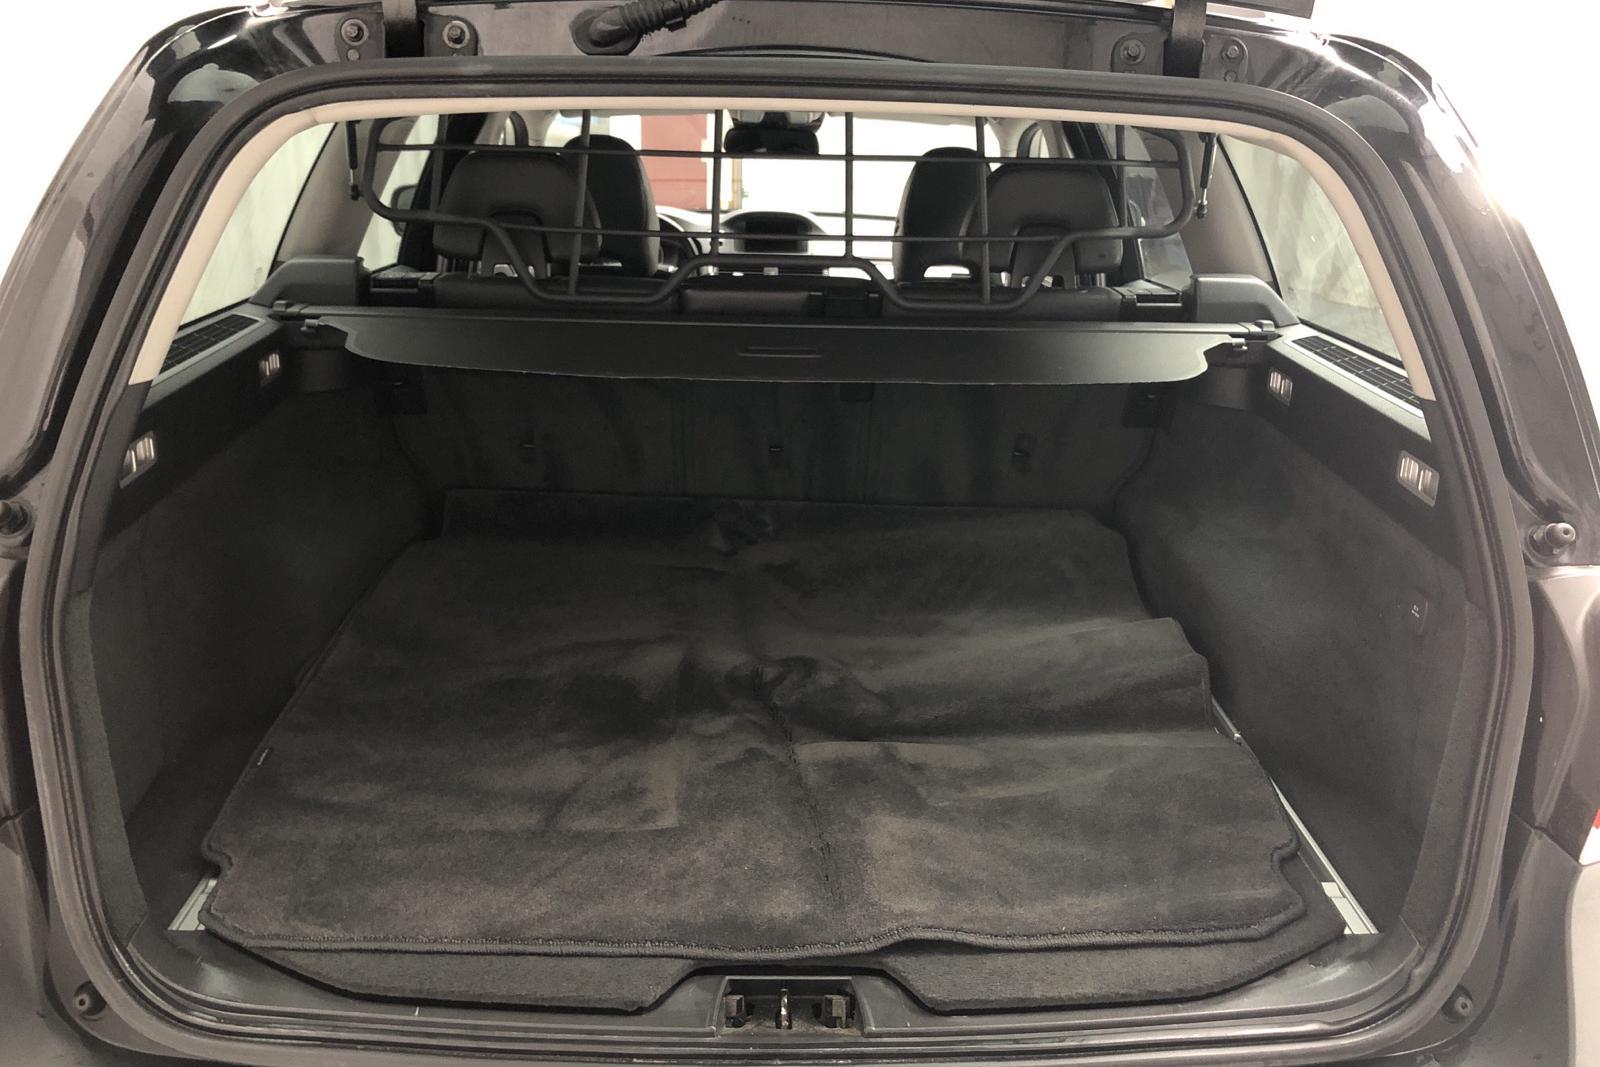 Volvo XC70 II D5 AWD (215hk) - 182 030 km - Automatic - black - 2014